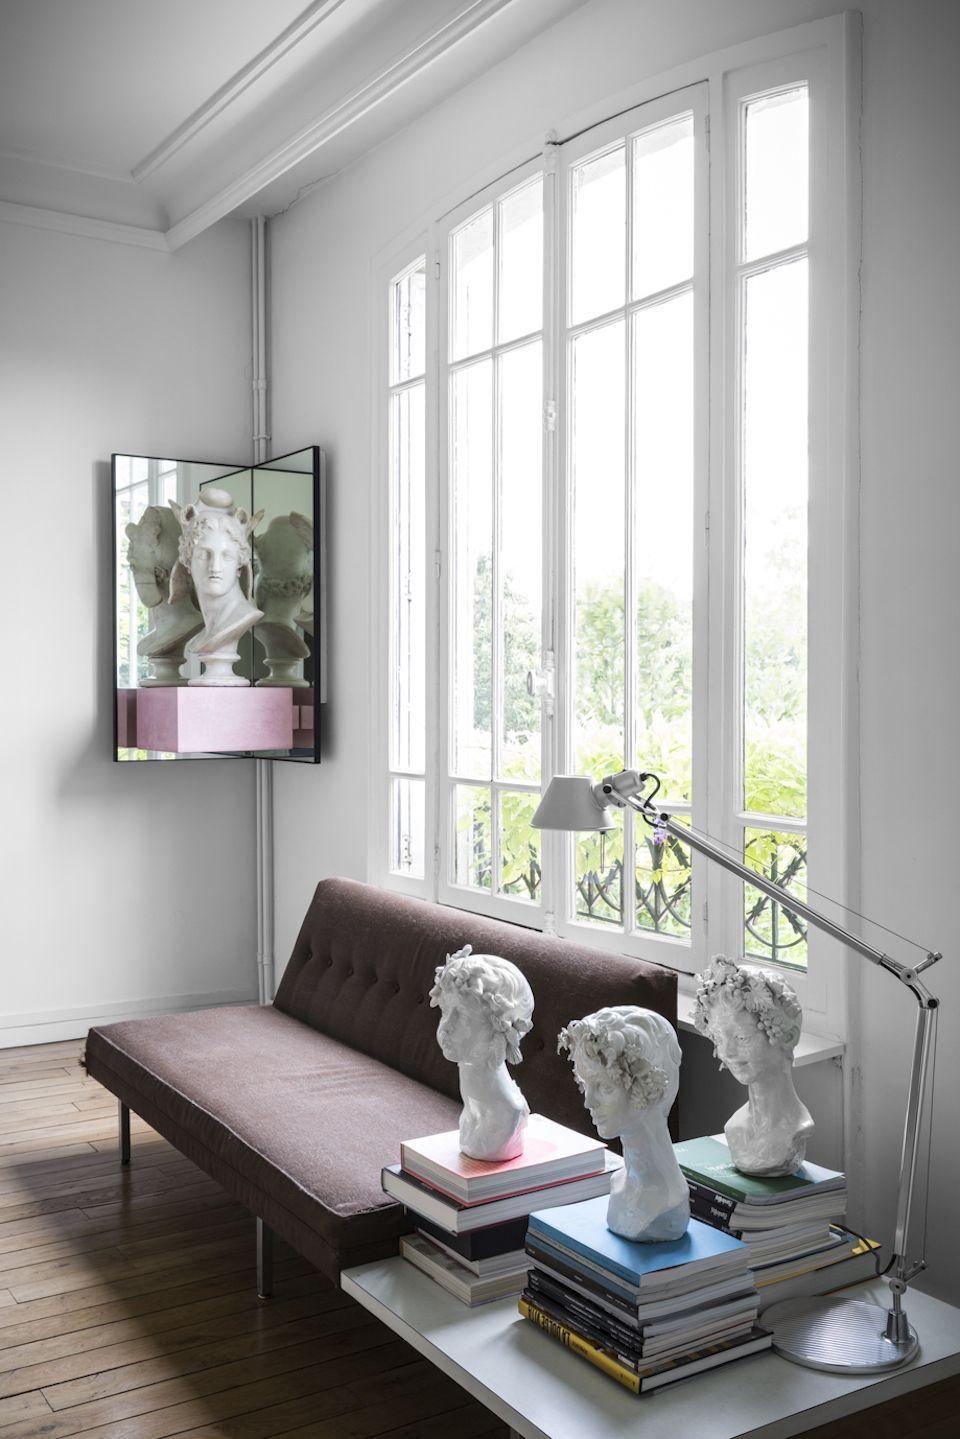 Chez Gherardo Felloni | Chez gerard, Decoration and Interiors